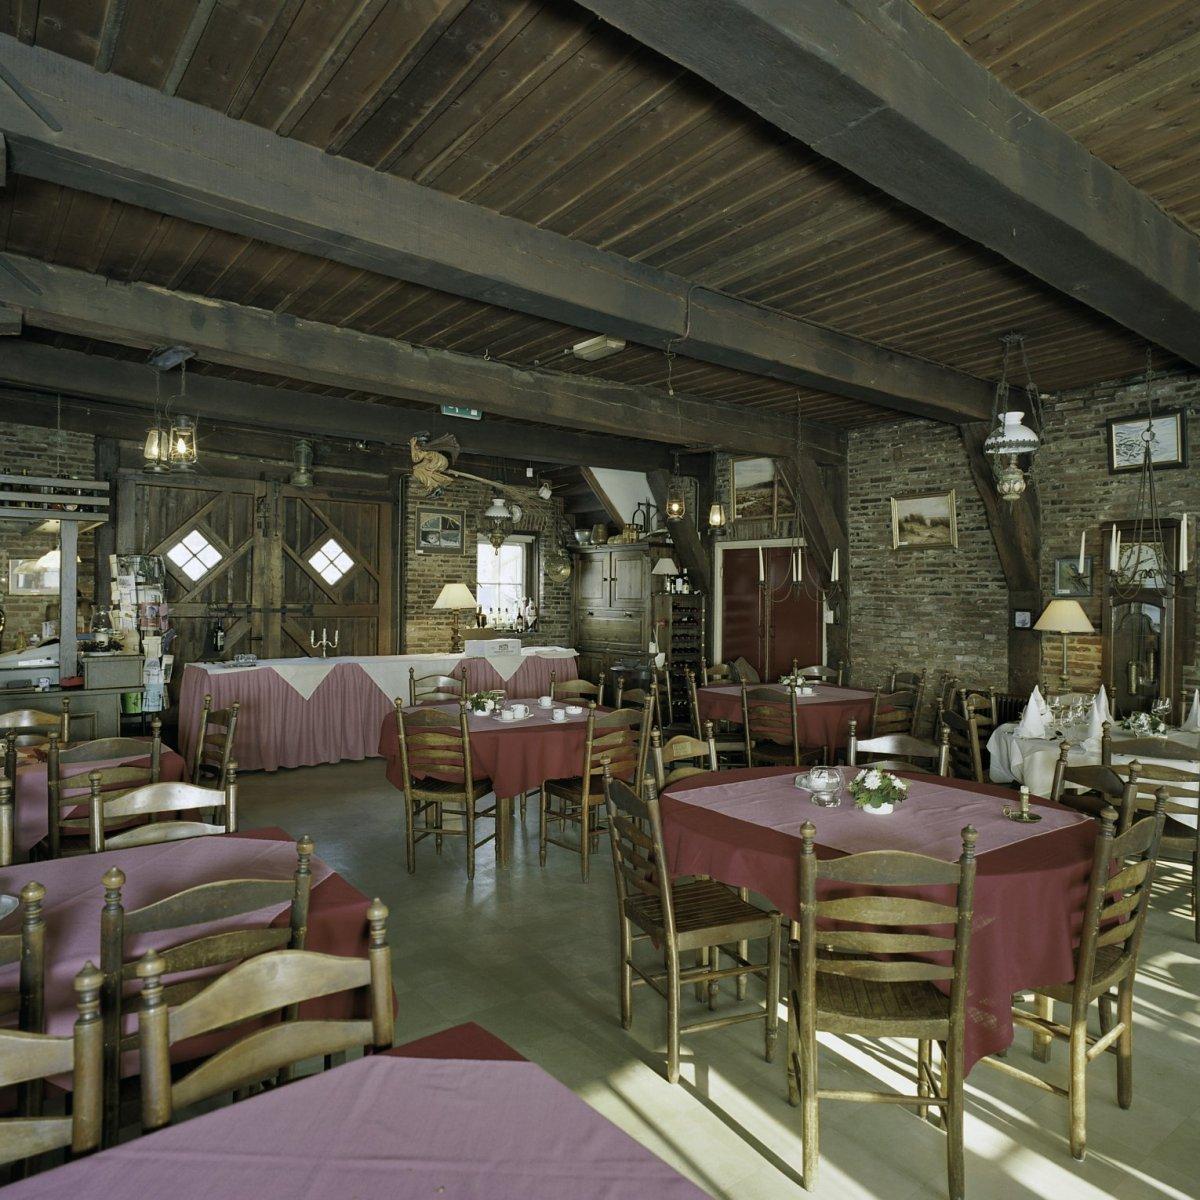 Salontafel houten balken - Interieur gevelbekleding houten ...